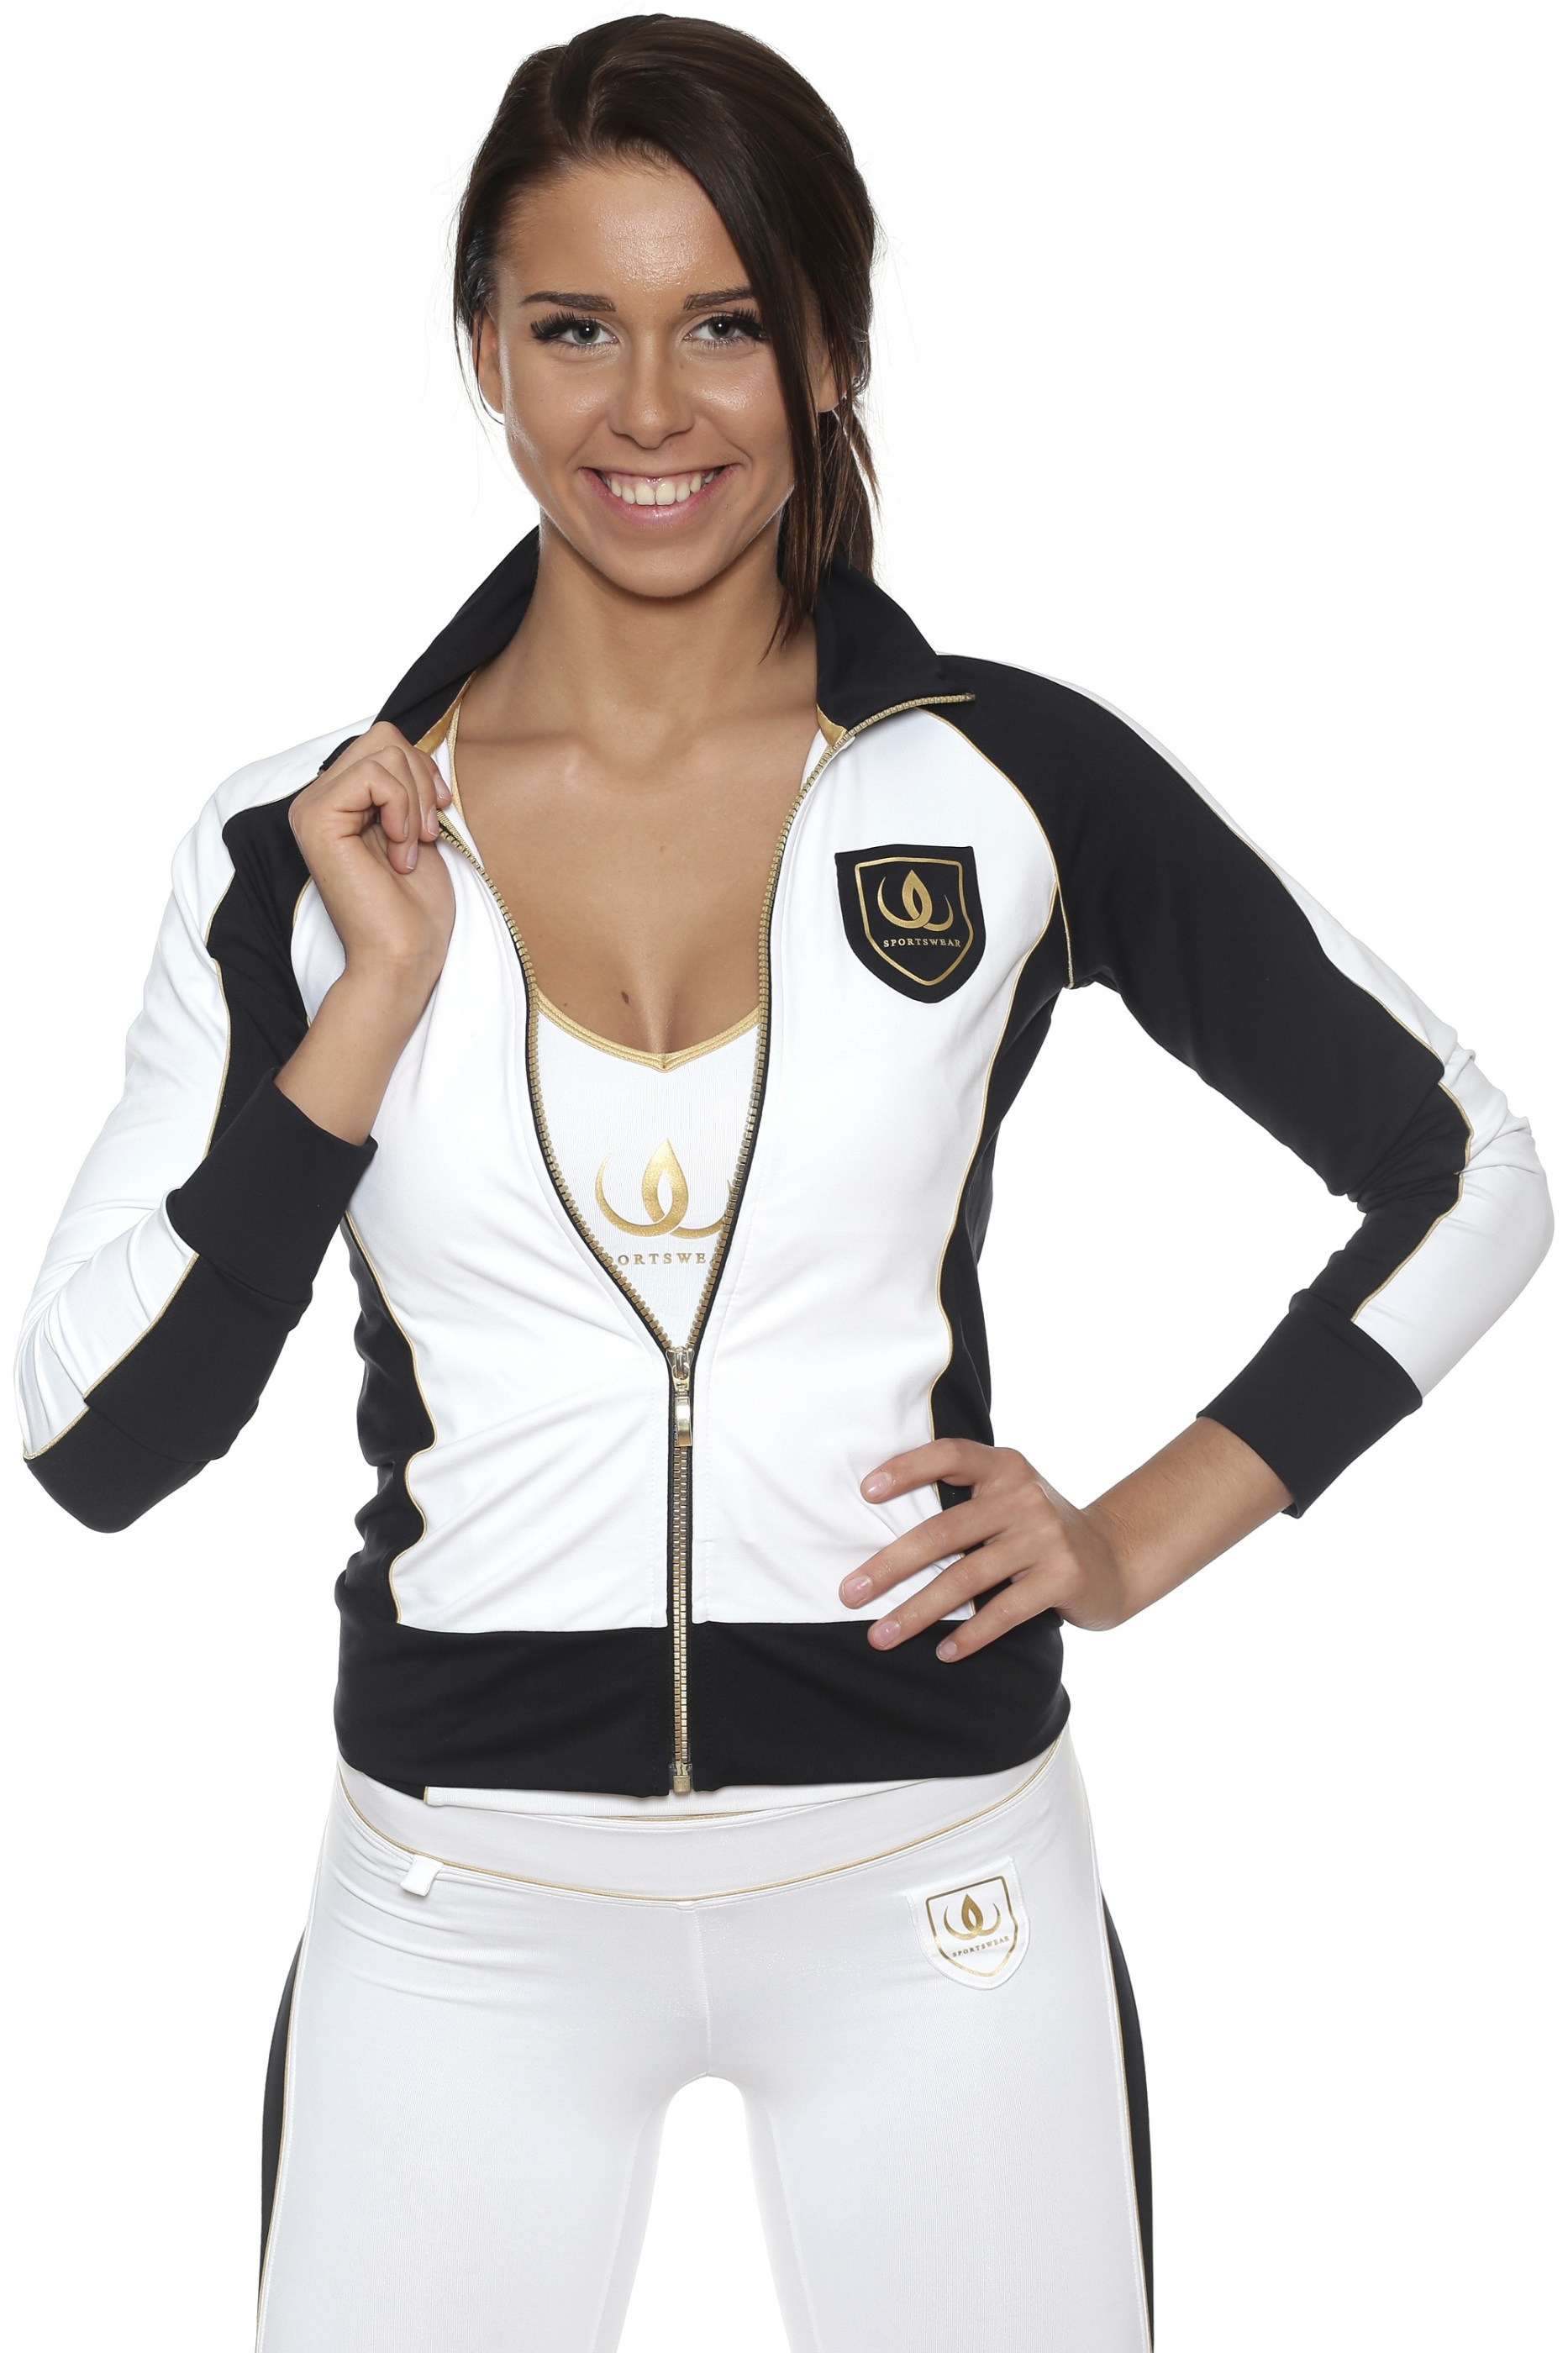 slimline-jacket-2 wallderinska IMAGE BY ME